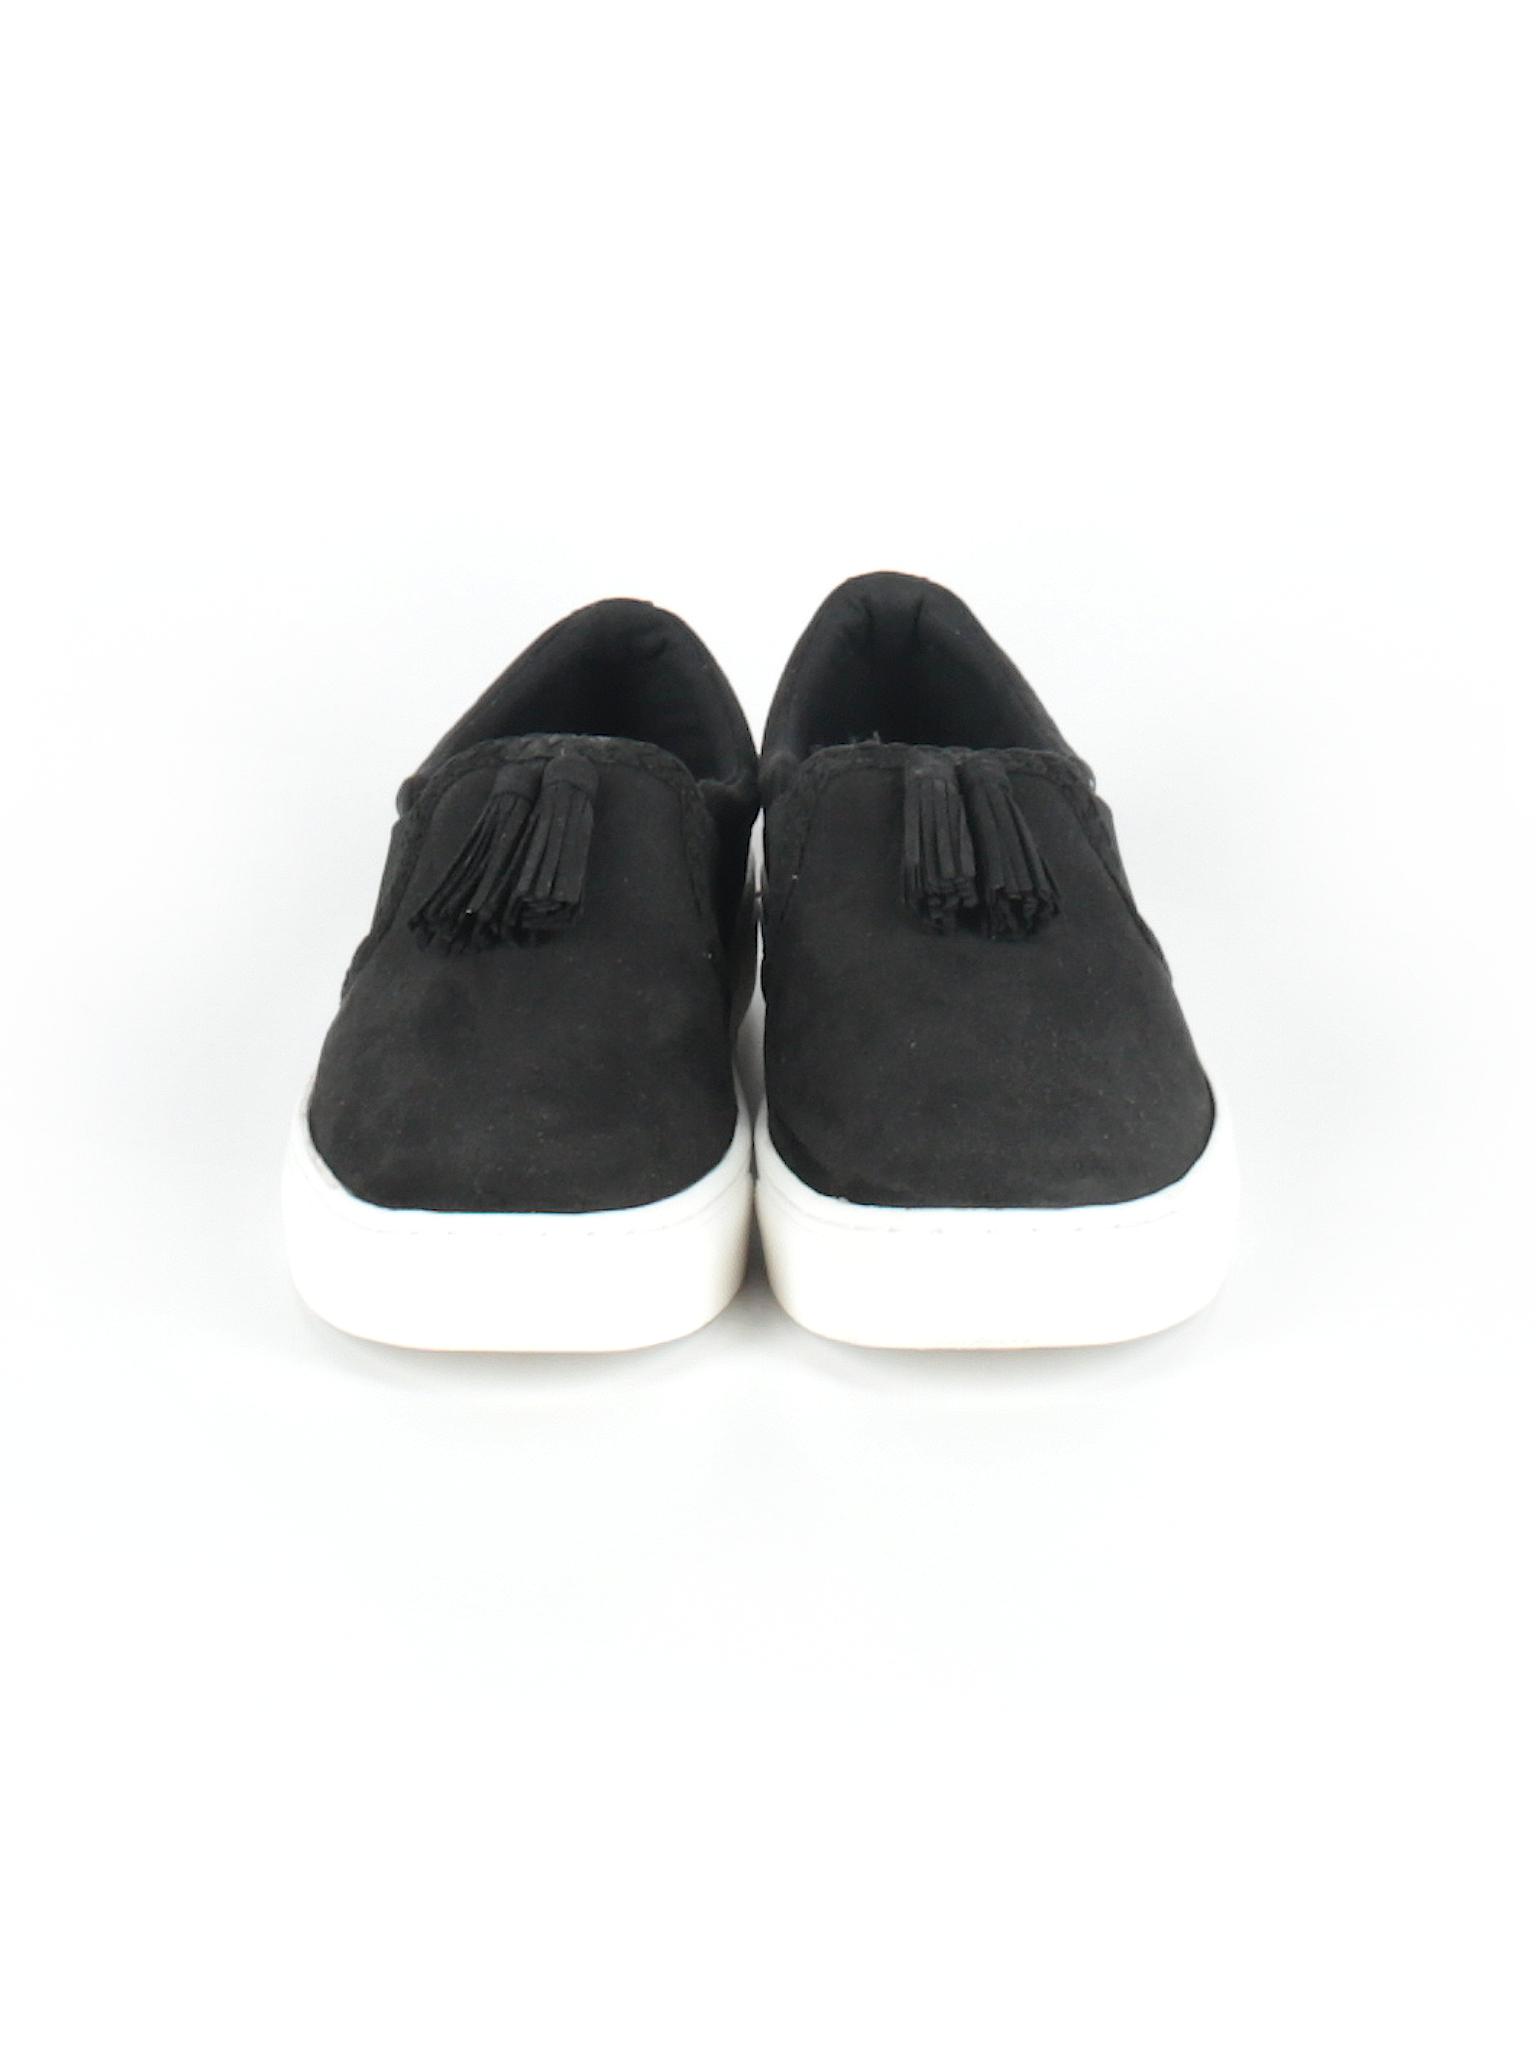 promotion Boutique Boutique promotion Rd Rd Sneakers Indigo Indigo 5qHnwUxTCB